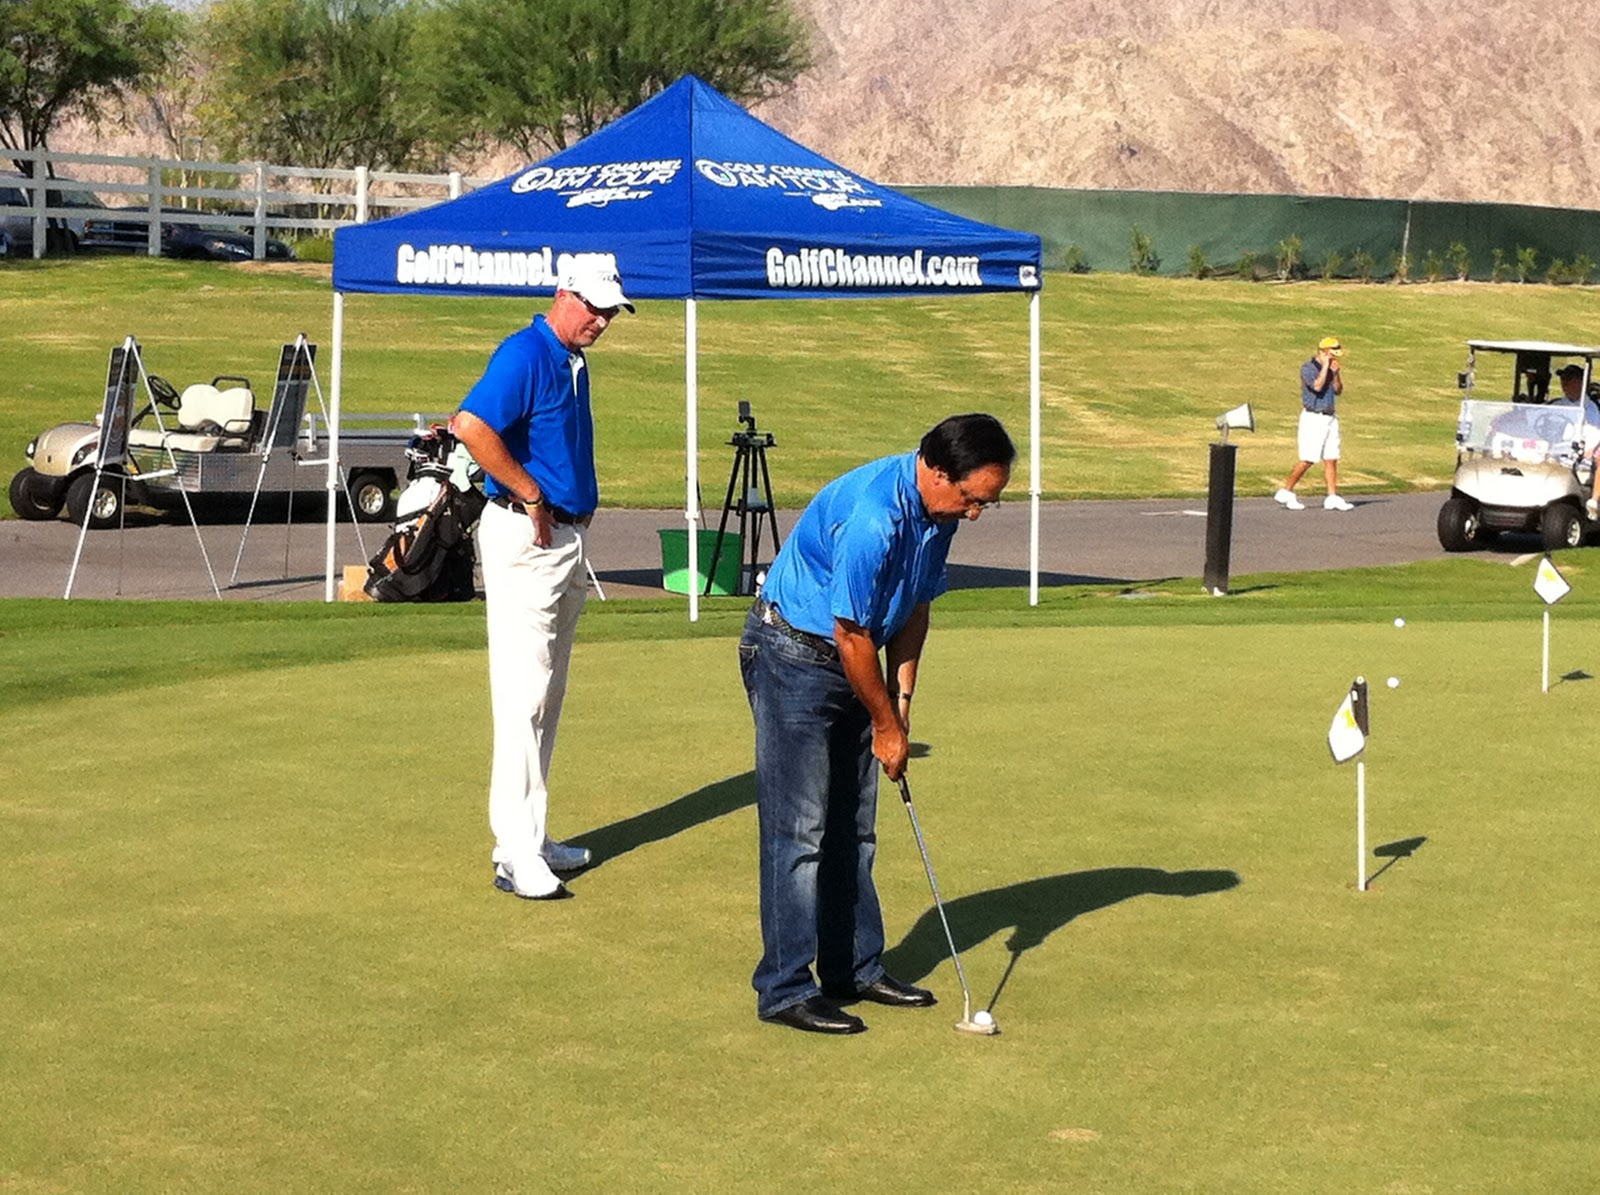 National Office - Major Events: Golf Galaxy PGA Professionals Golf Galaxy